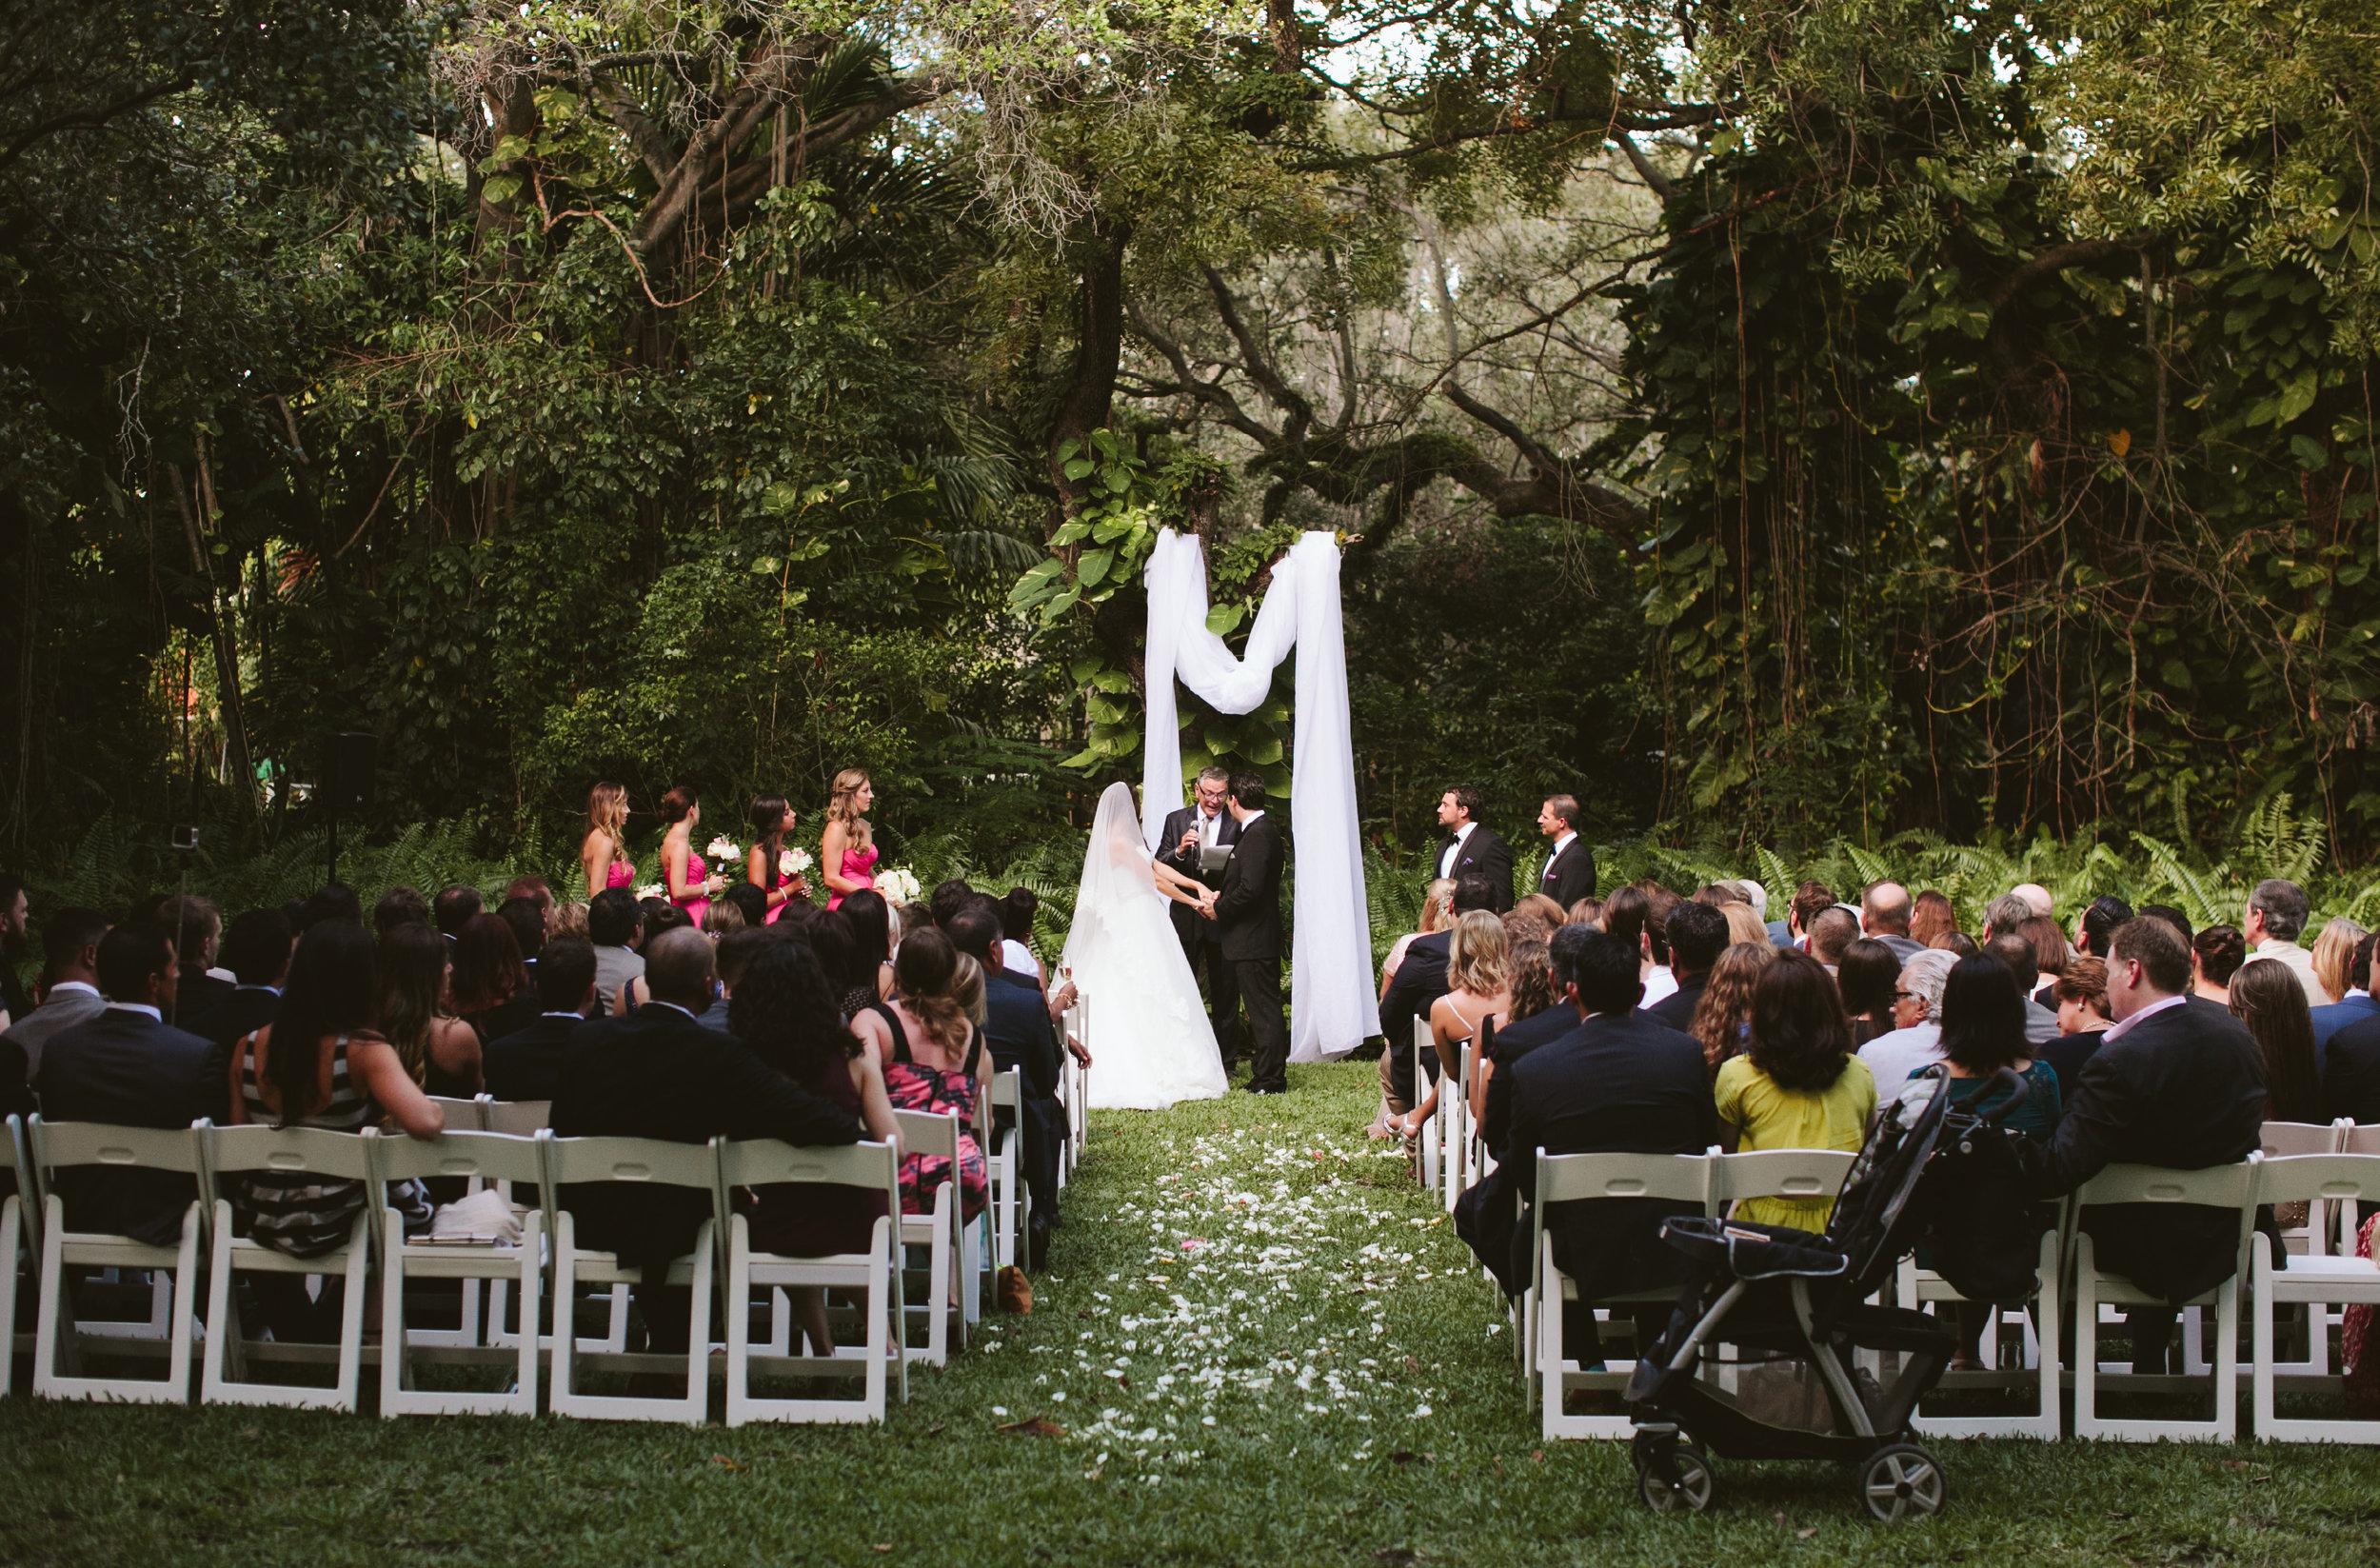 Meli + Mike Coconut Grove Wedding at Villa Woodbine48.jpg